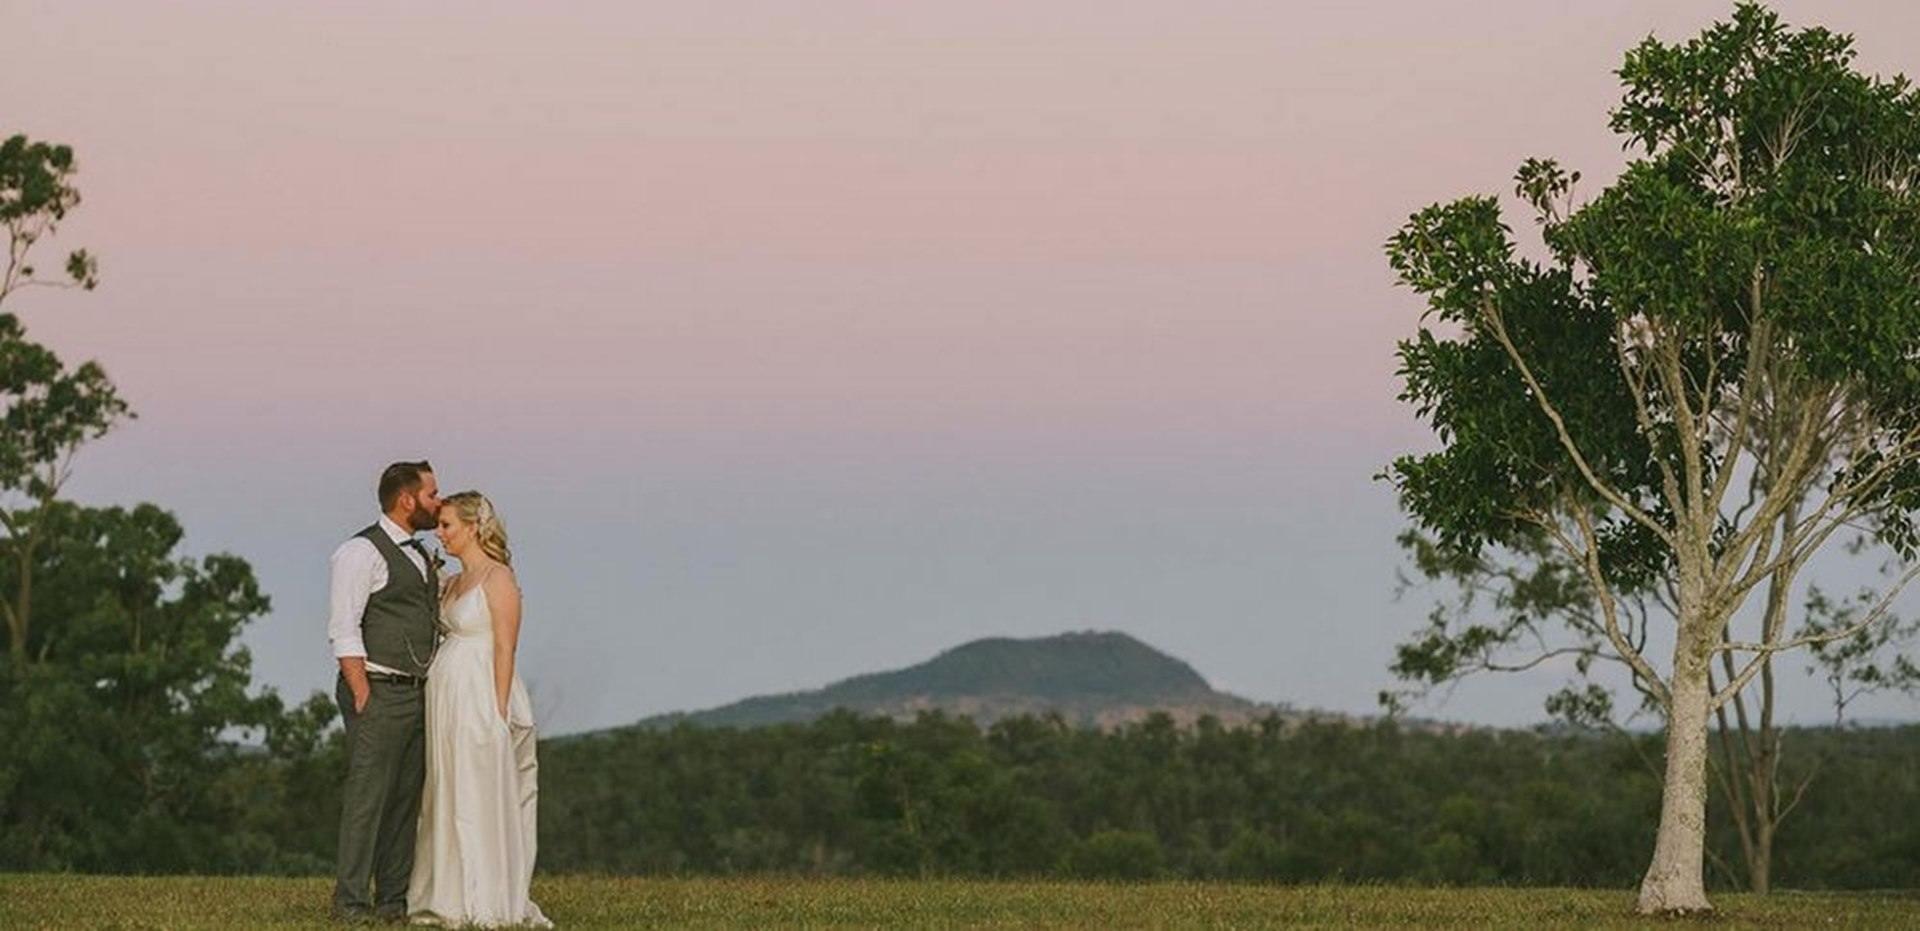 Wedding Venue - Spicers Hidden Vale 28 on Veilability